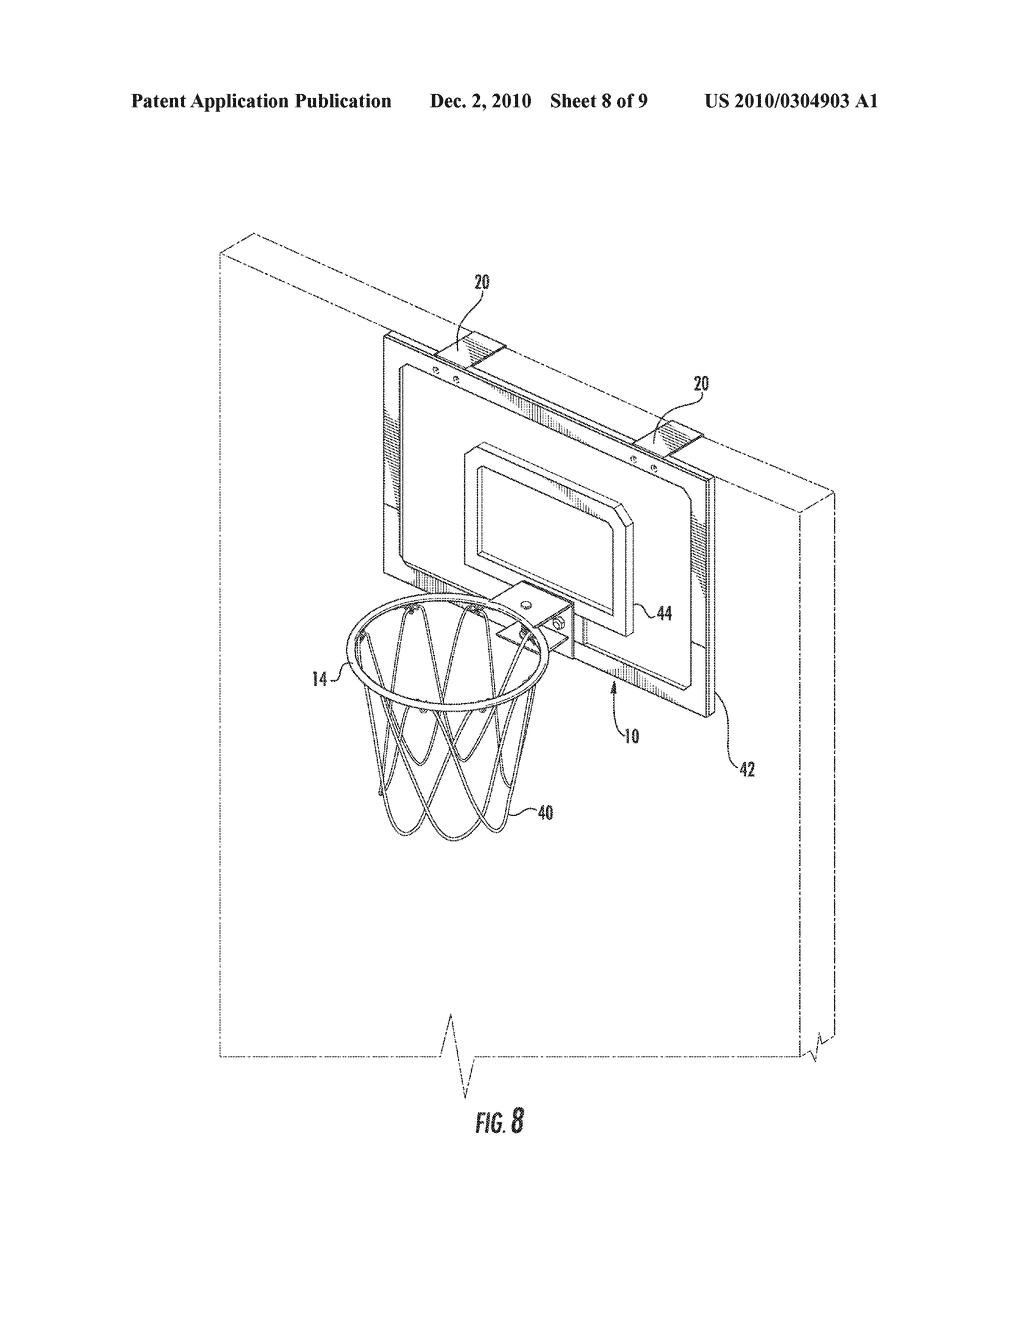 miniature door mounted basketball hoop diagram schematic and rh patentsencyclopedia com basketball hoop height diagram Parts of a Basketball Hoop